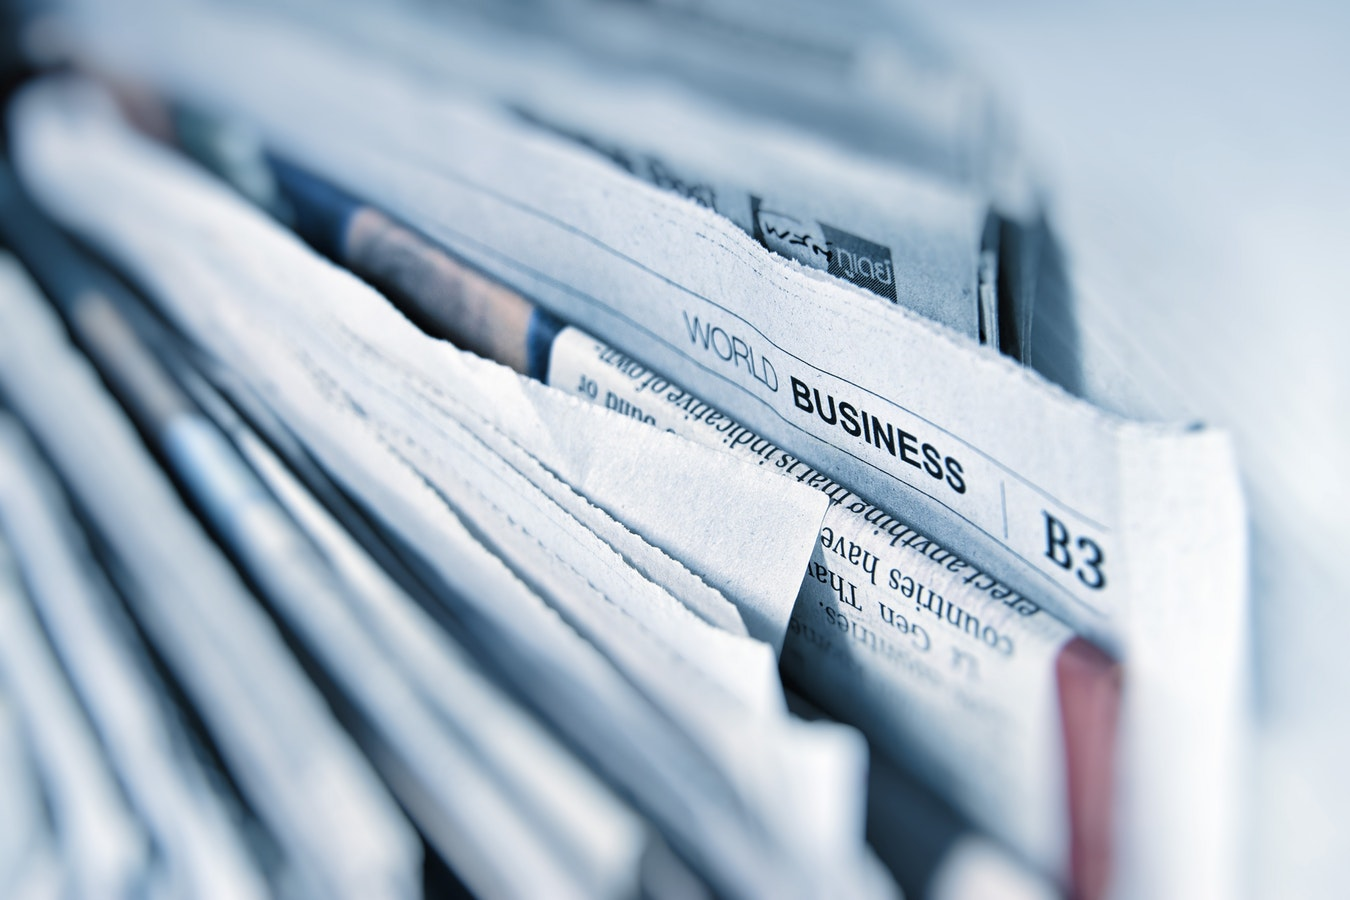 Educational News - Newspaper